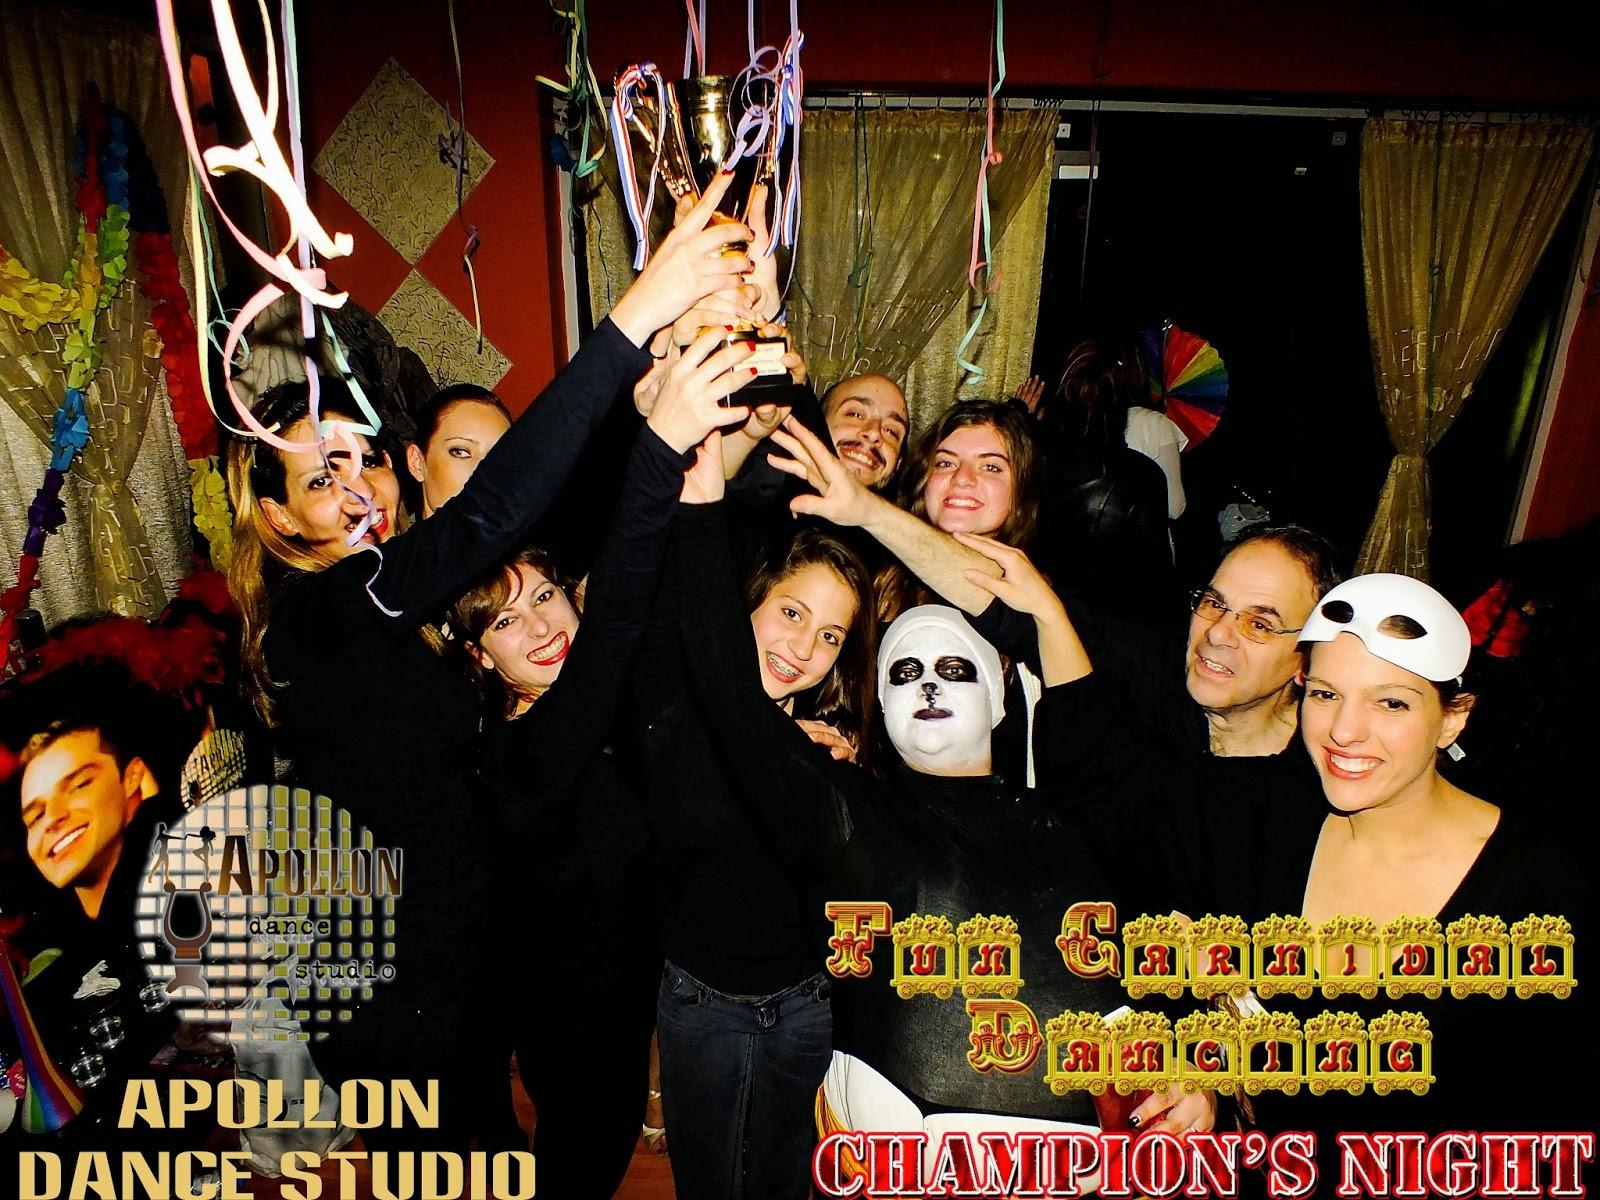 4da9dc2194 Apollon dance studio  ΝΙΚΗΤΡΙΑ ΣΧΟΛΗ - Fun Carnival Dancing 2015!!!